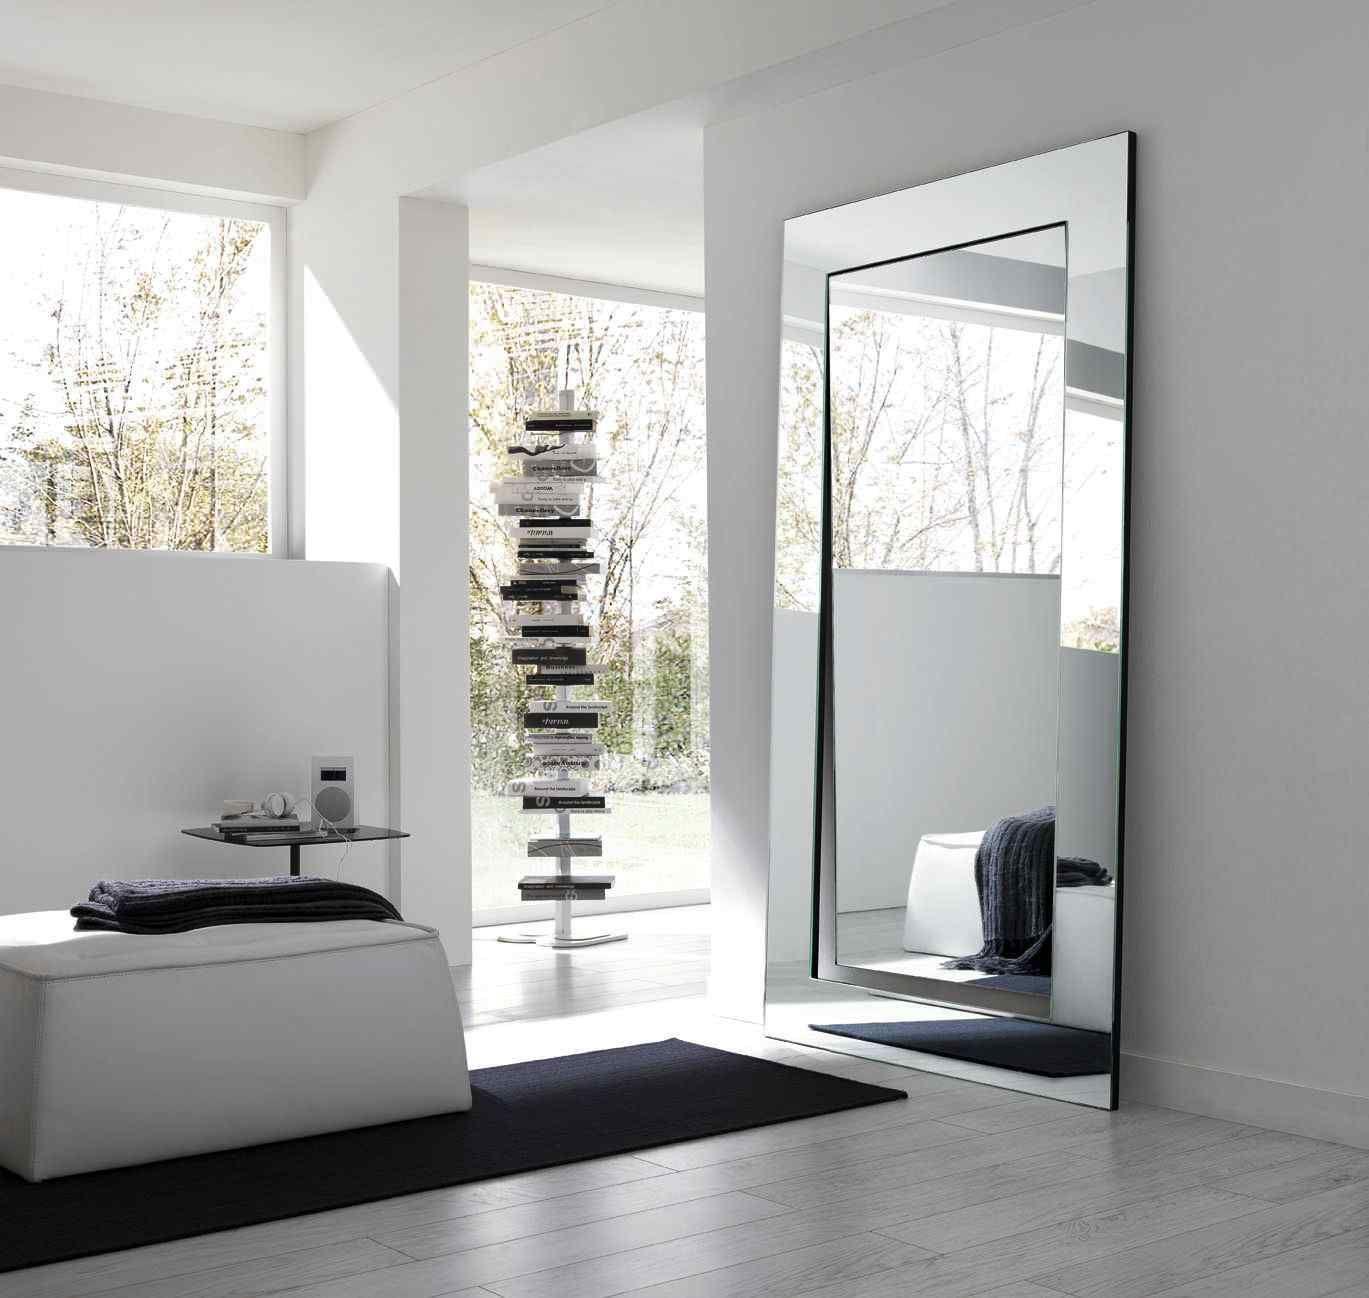 grand miroir design salon mur idee